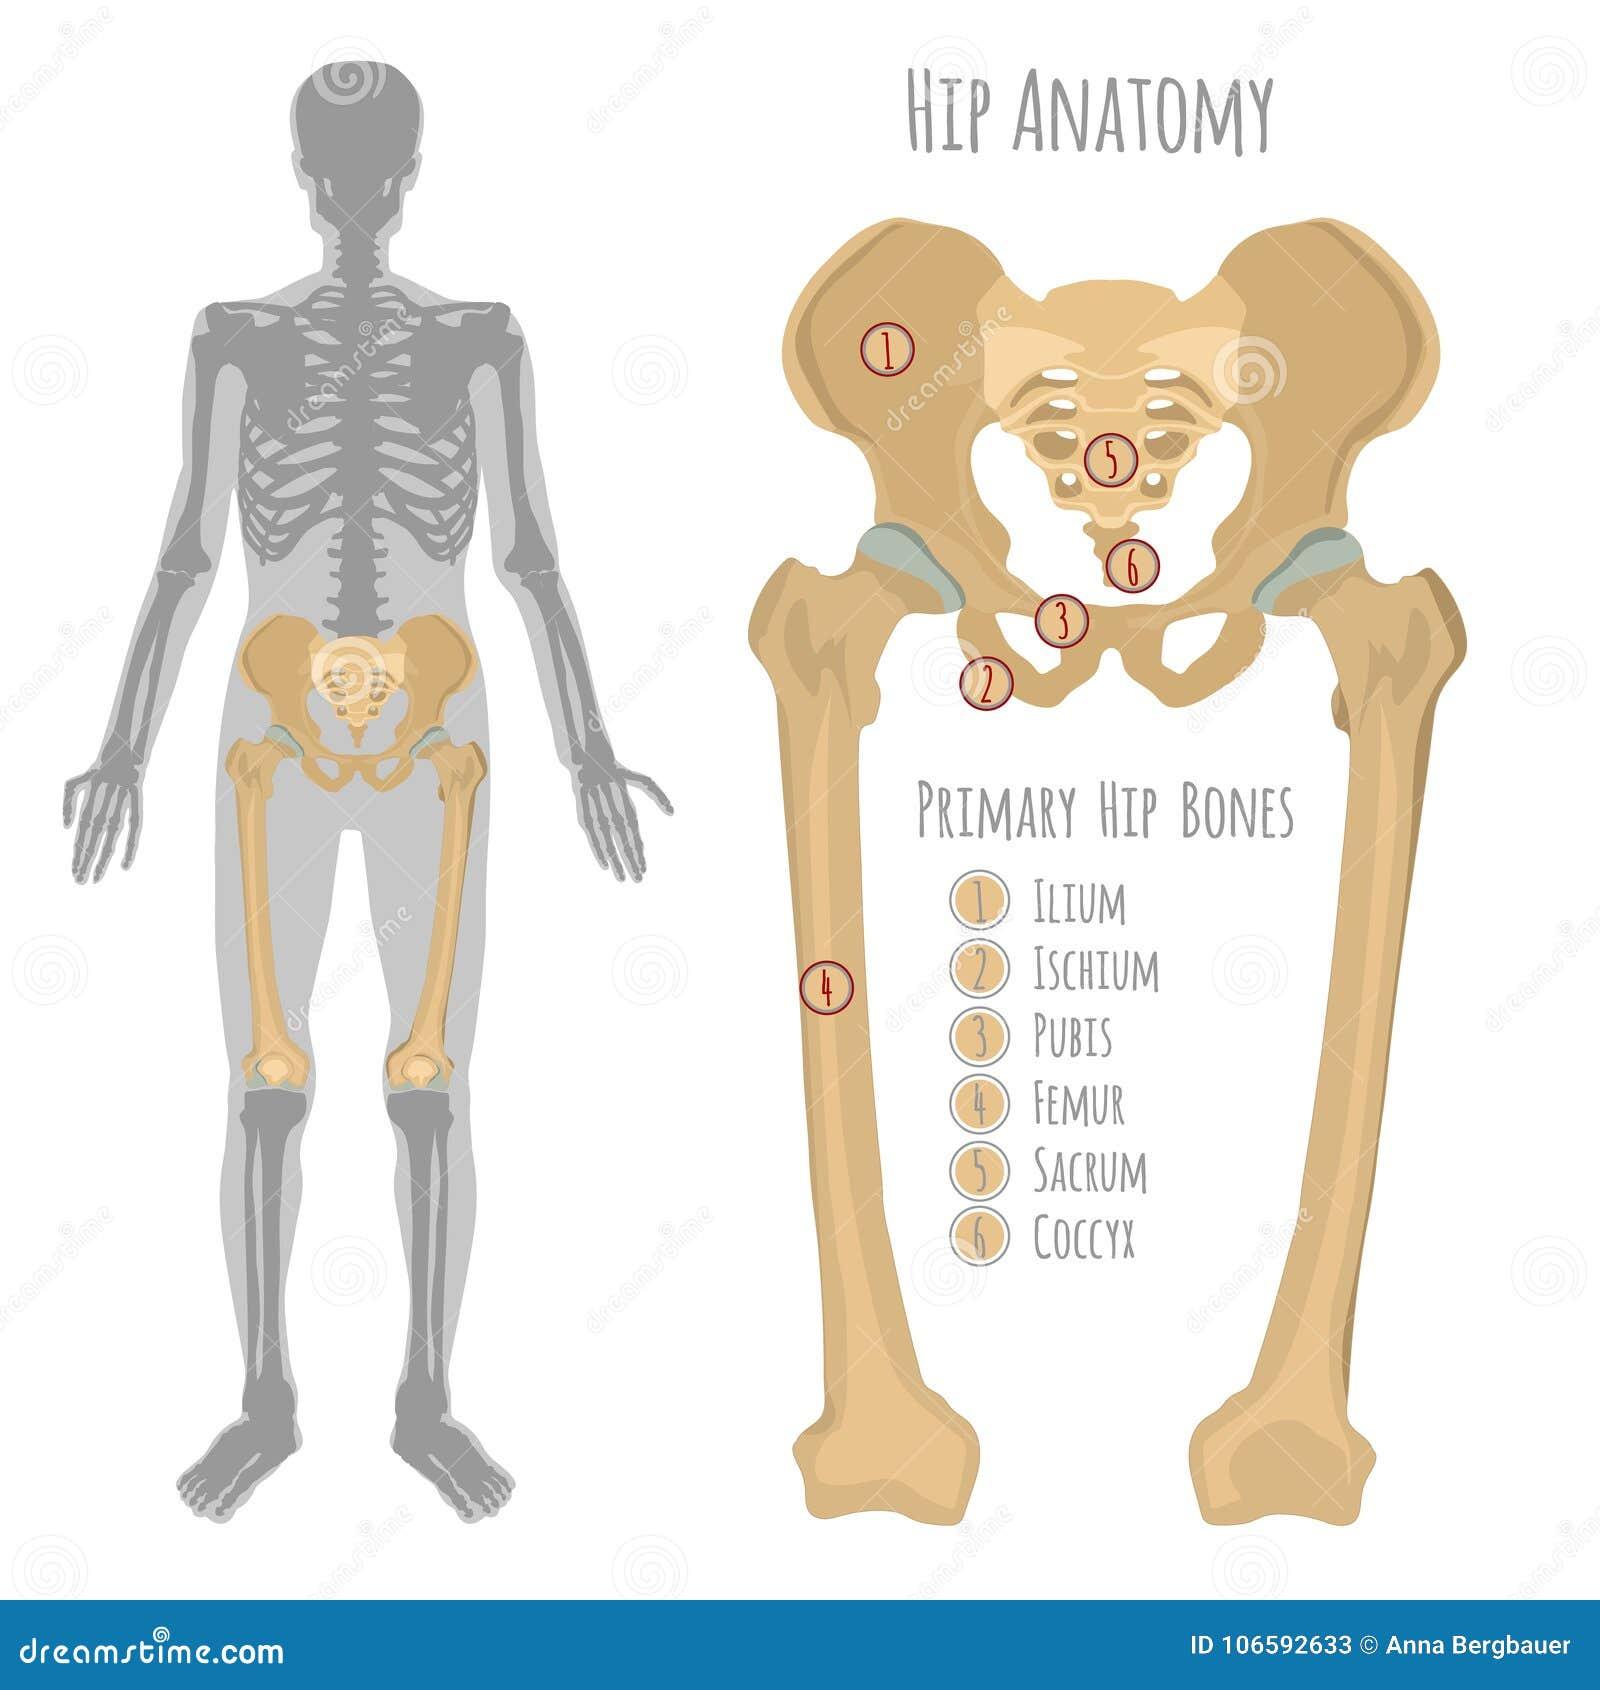 dolor de hueso de la cadera superior